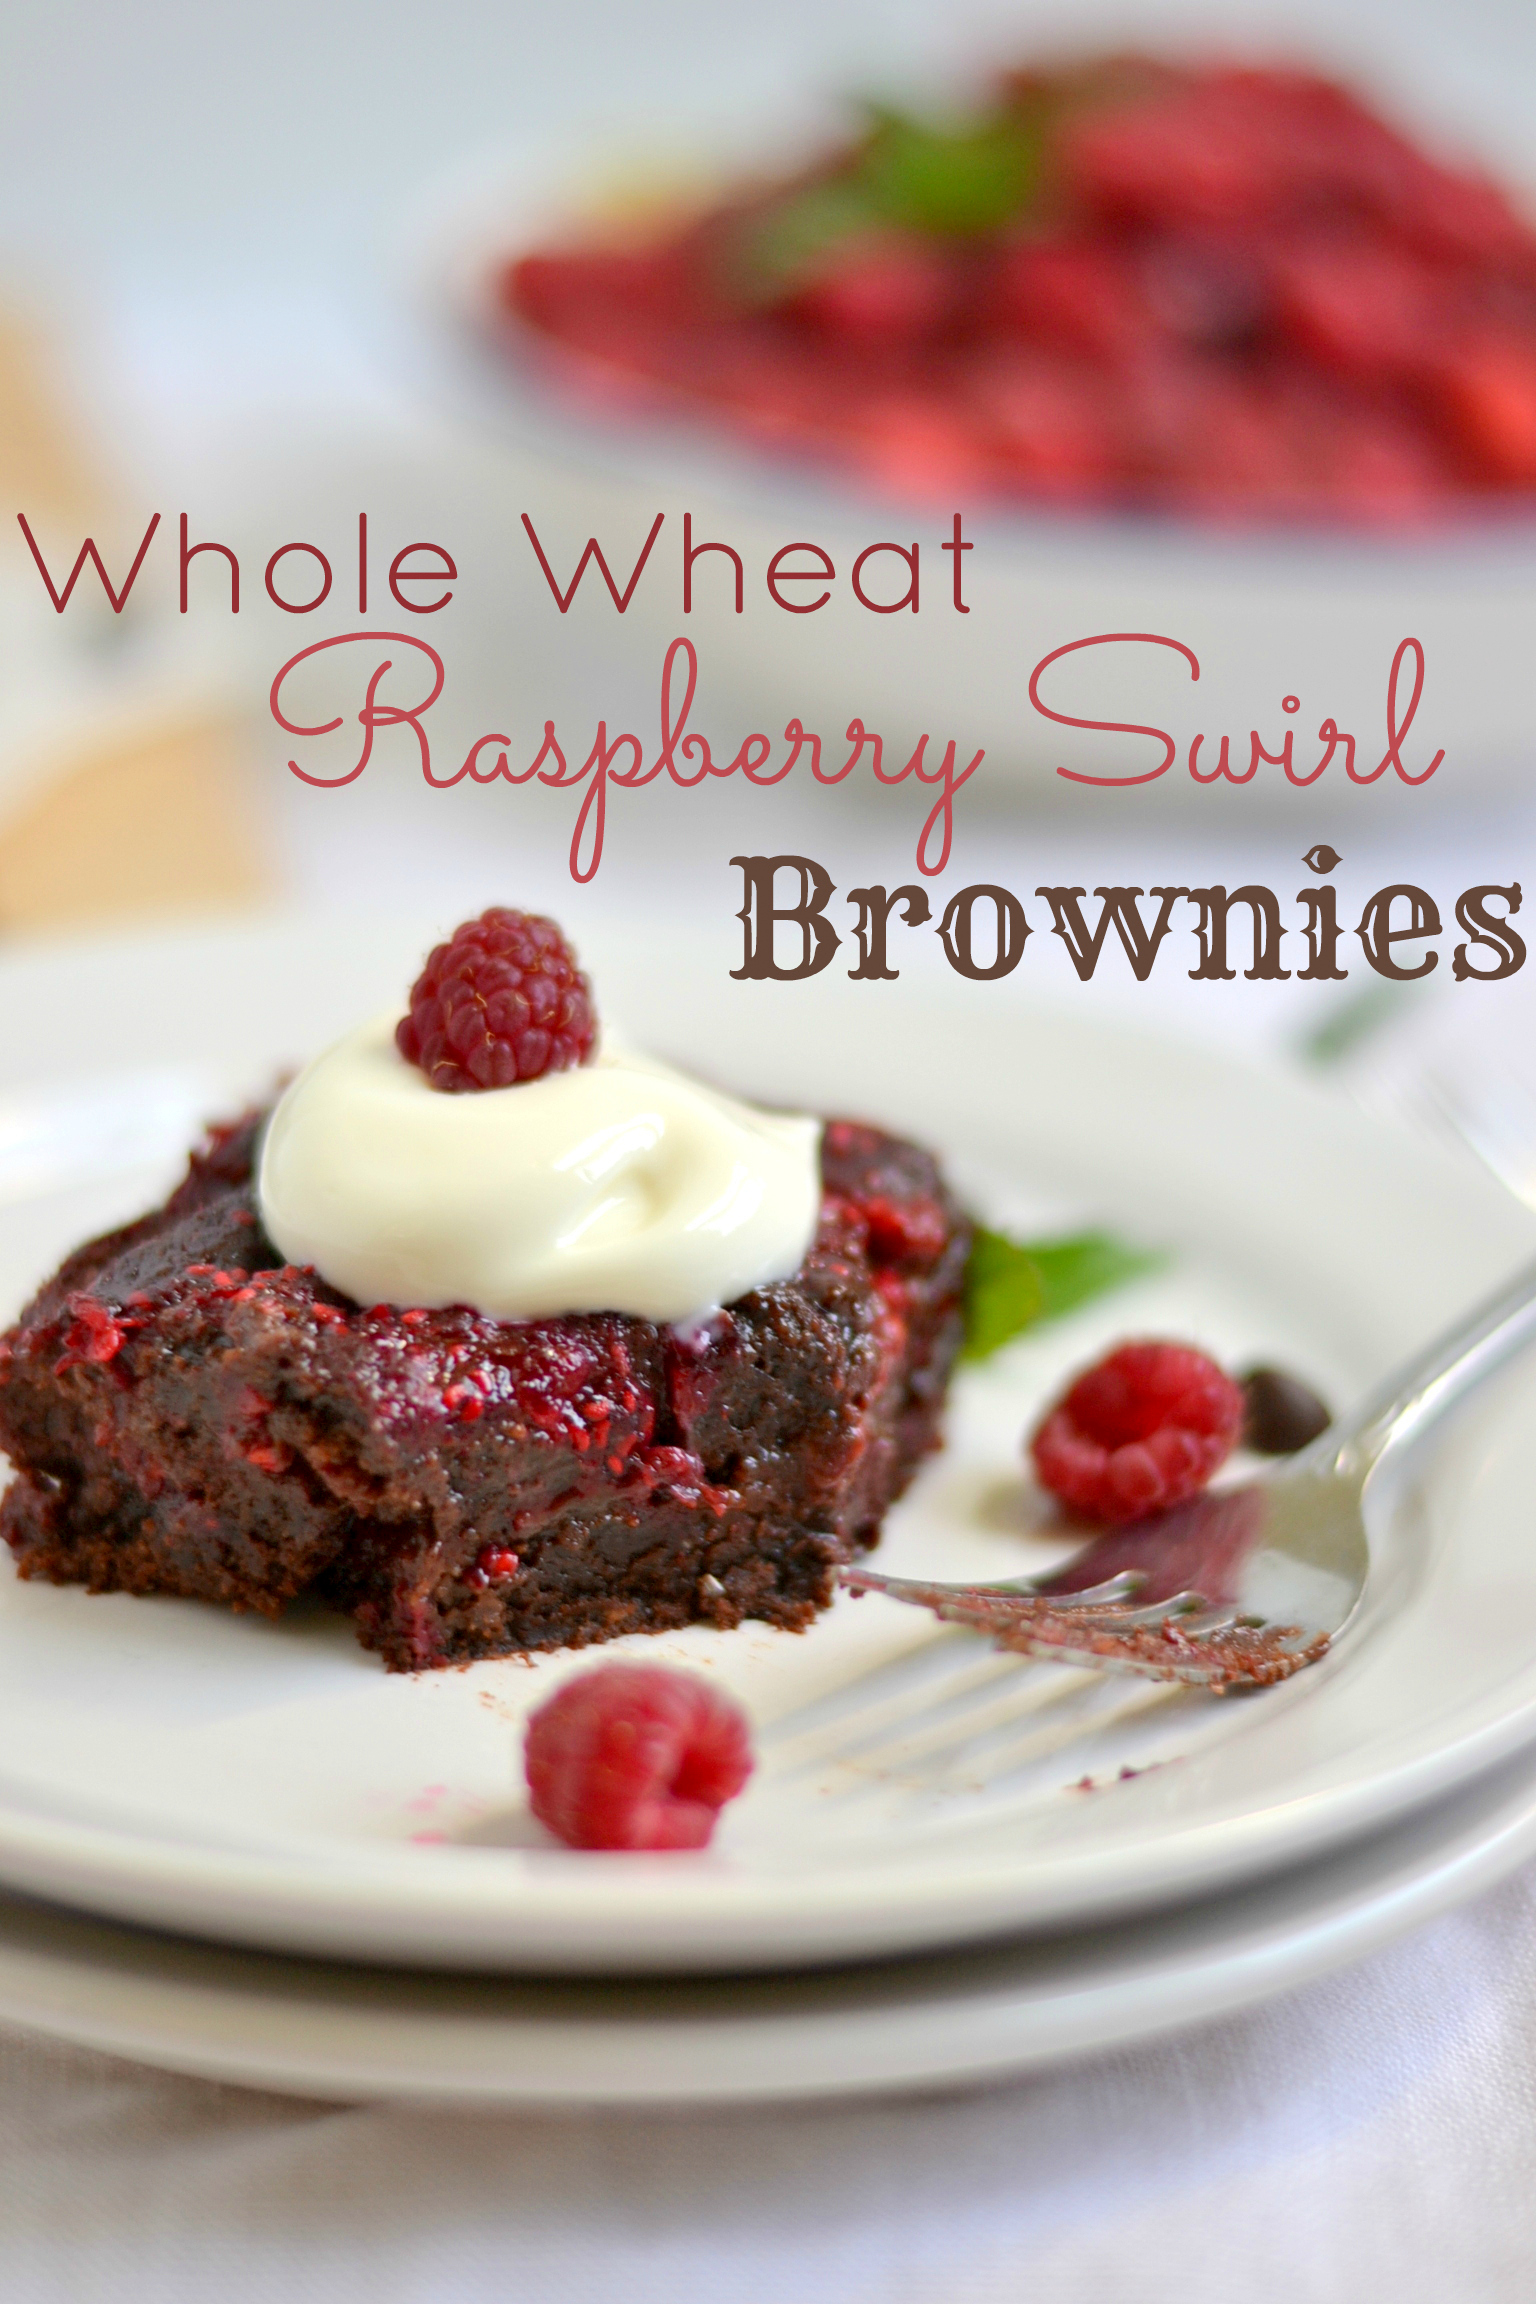 Whole Wheat Raspberry Swirl Brownies photo